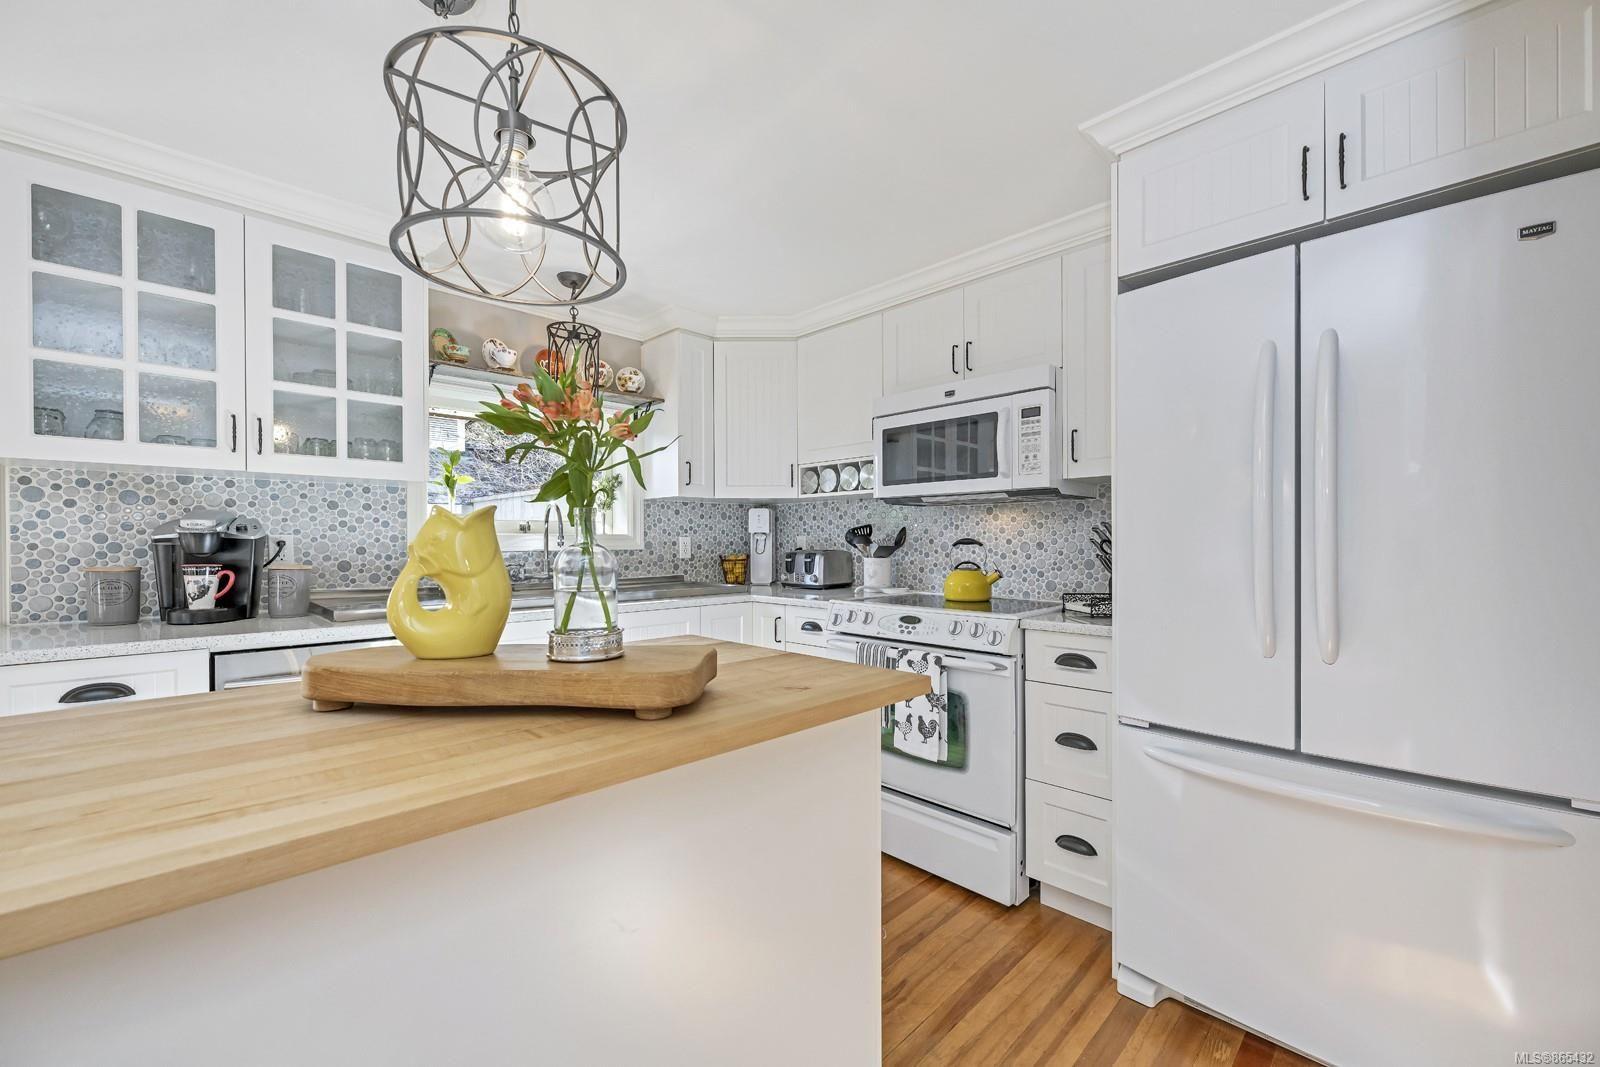 Photo 6: Photos: 6734 Drummond Dr in : Du East Duncan House for sale (Duncan)  : MLS®# 865432